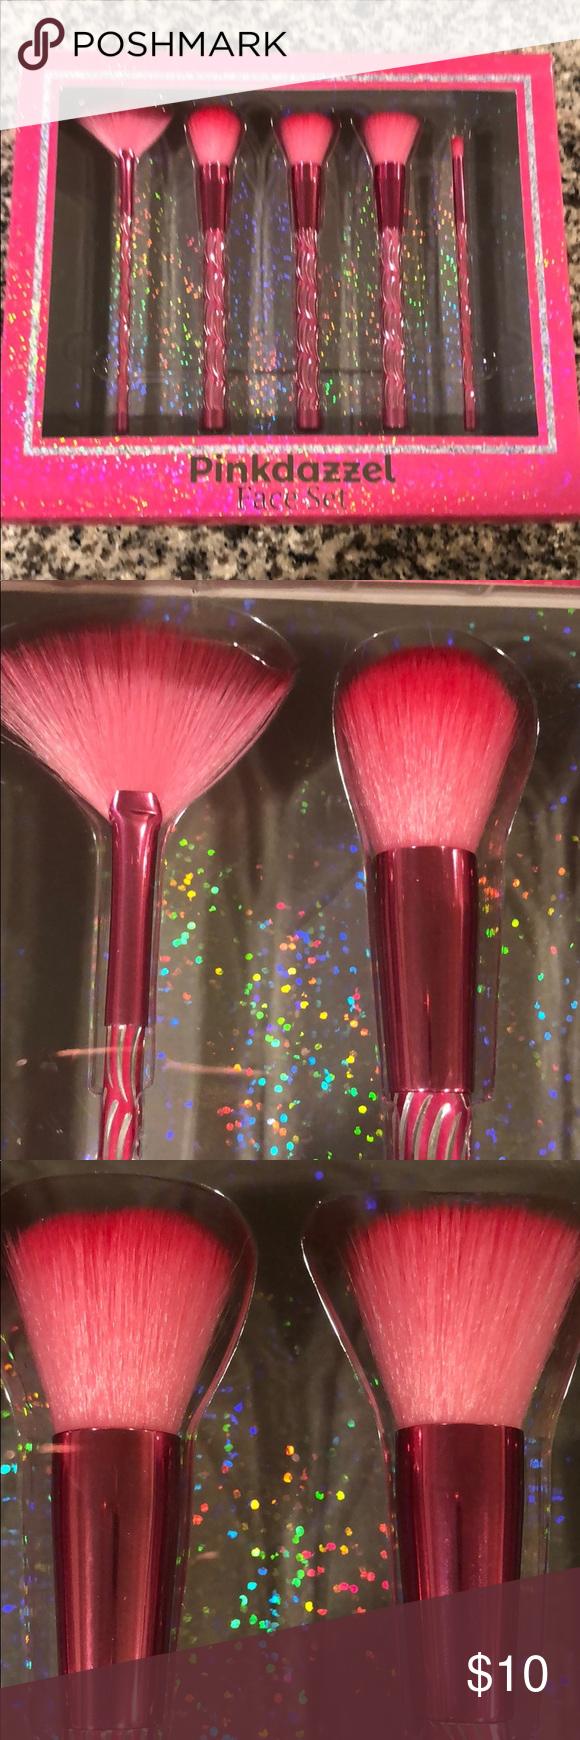 NWT pinkdazzel Makeup brushes set in 2020 Makeup brush